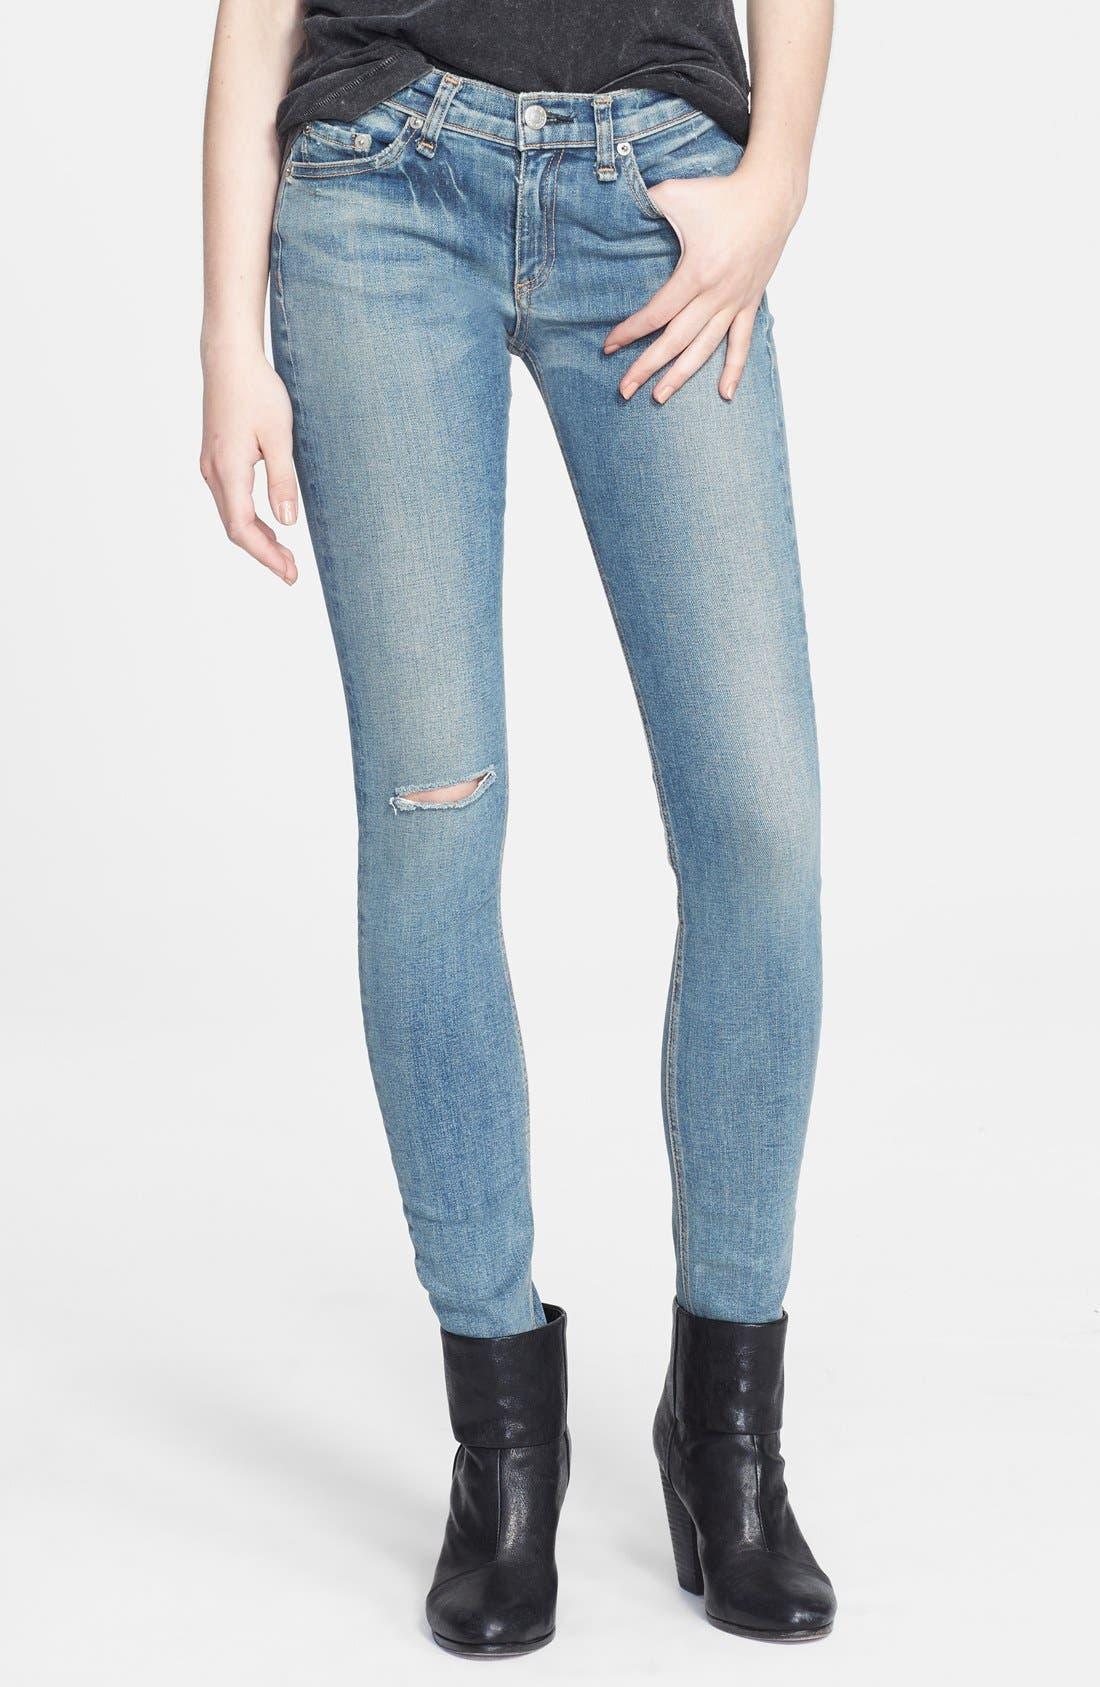 Main Image - rag & bone/JEAN Stretch Skinny Jeans (Water Street)